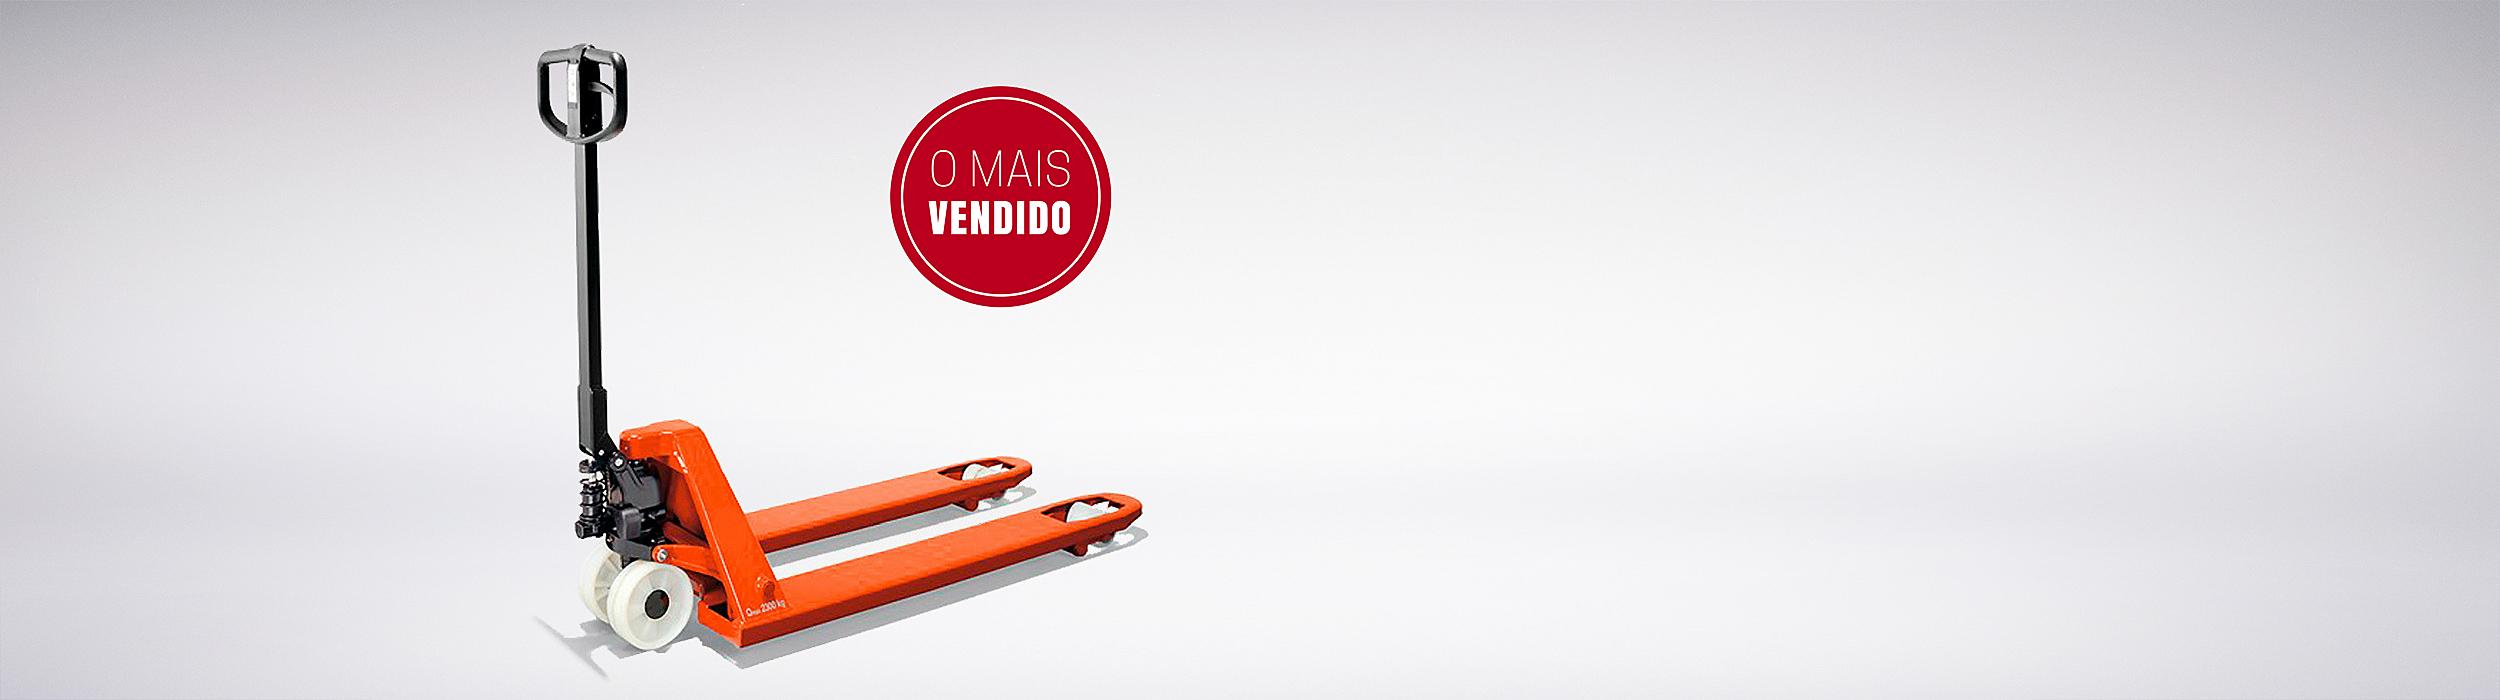 Toyota Caetano Portugal Equipamento Industrial